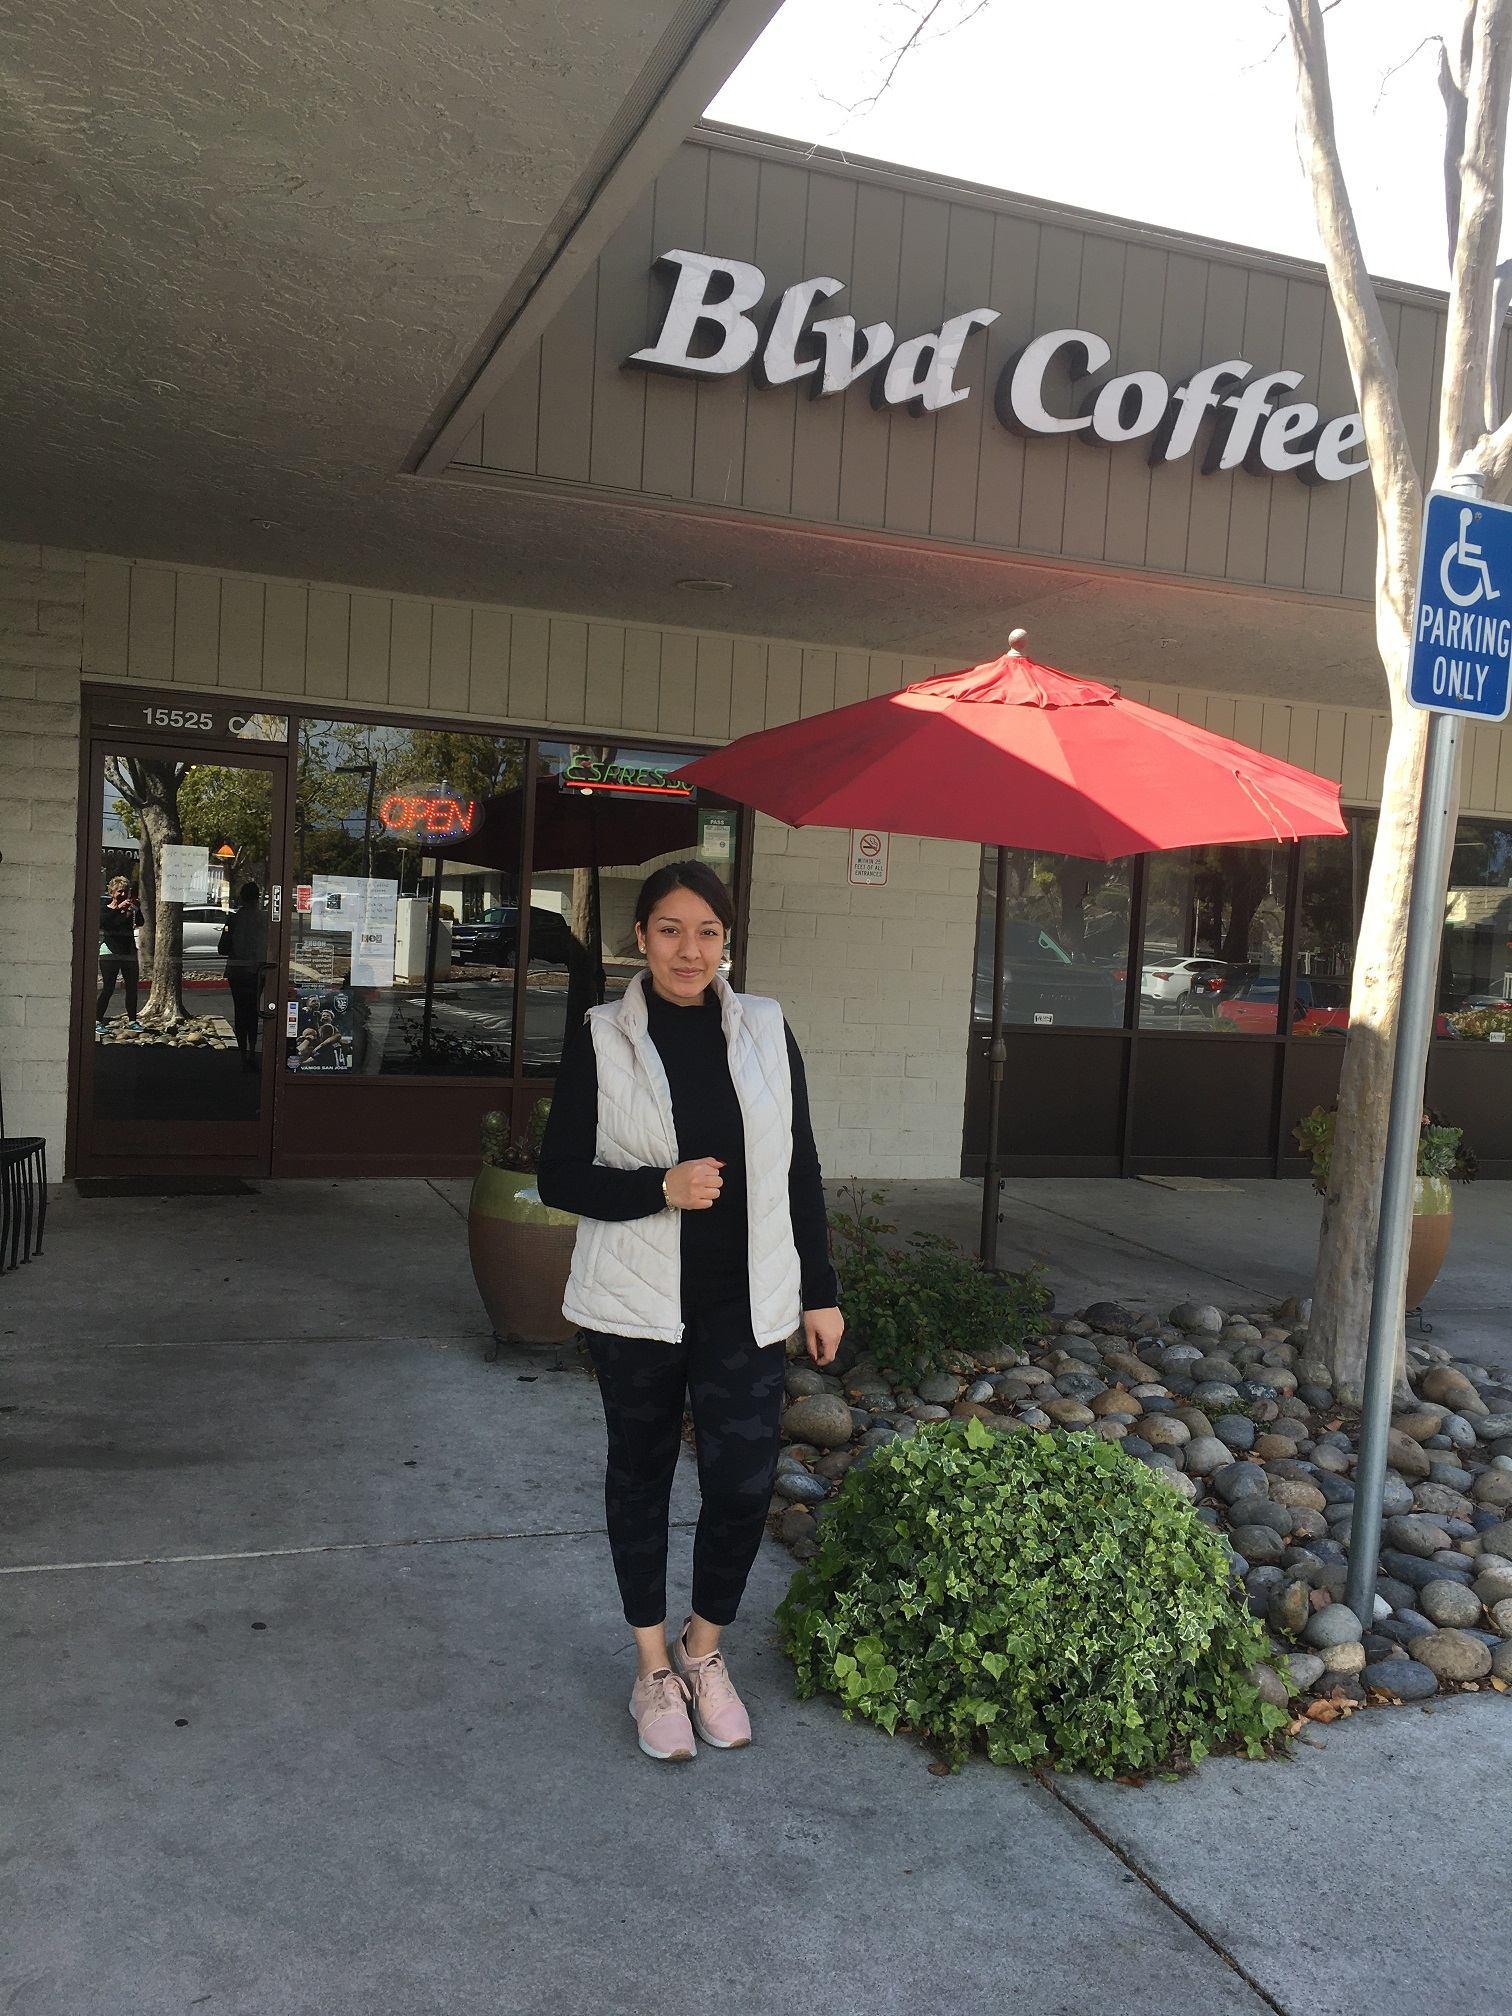 Blvd Coffee 1